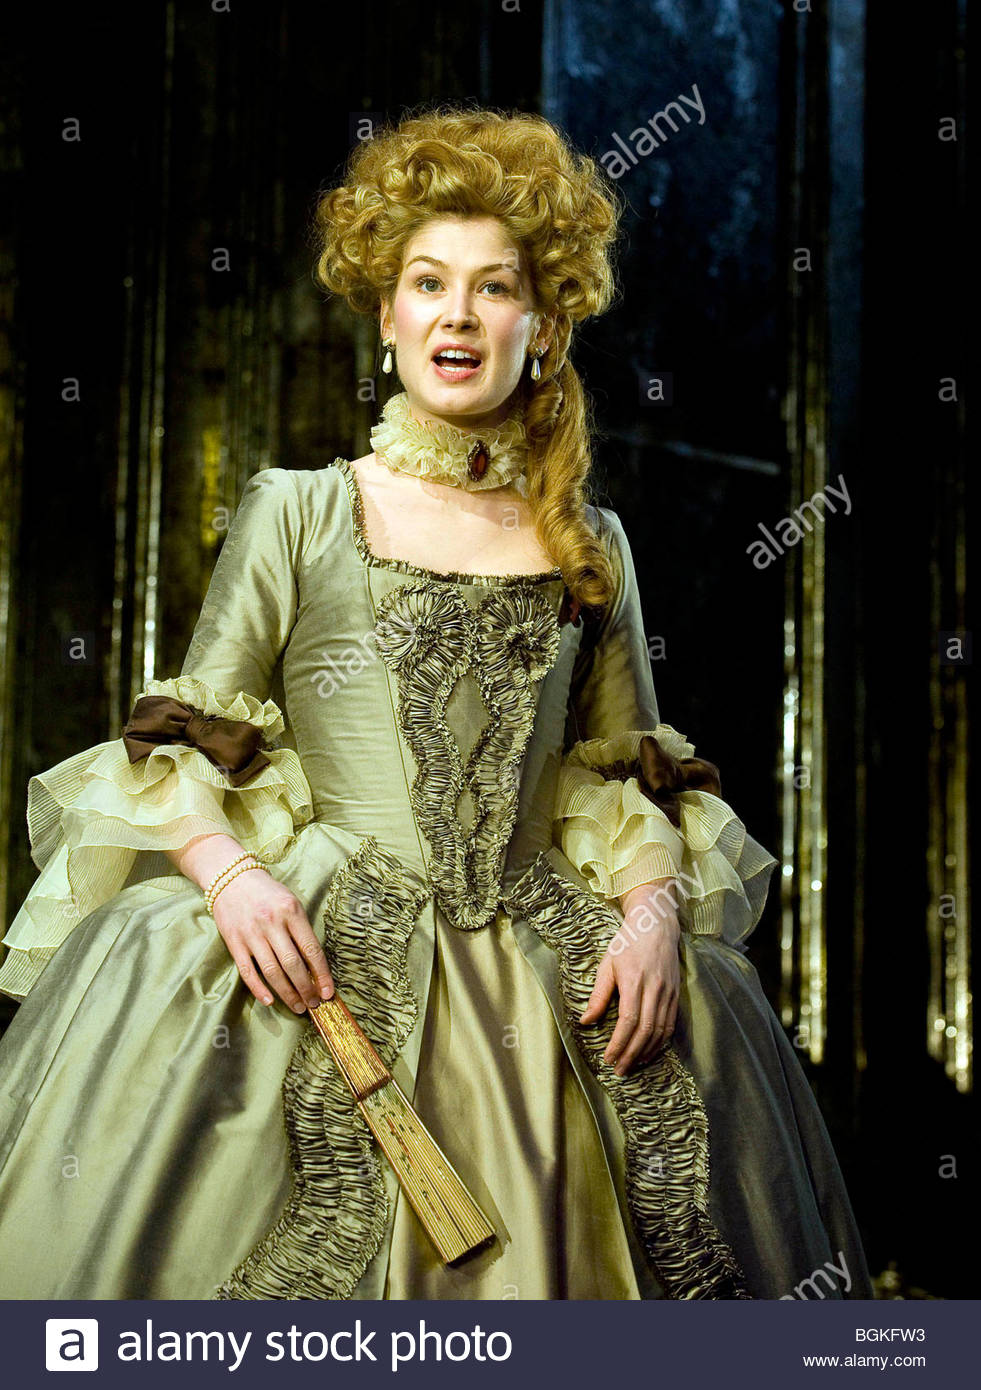 Madame De Sade by Yukio Mishima,directed by Michael Grandage - Stock Image